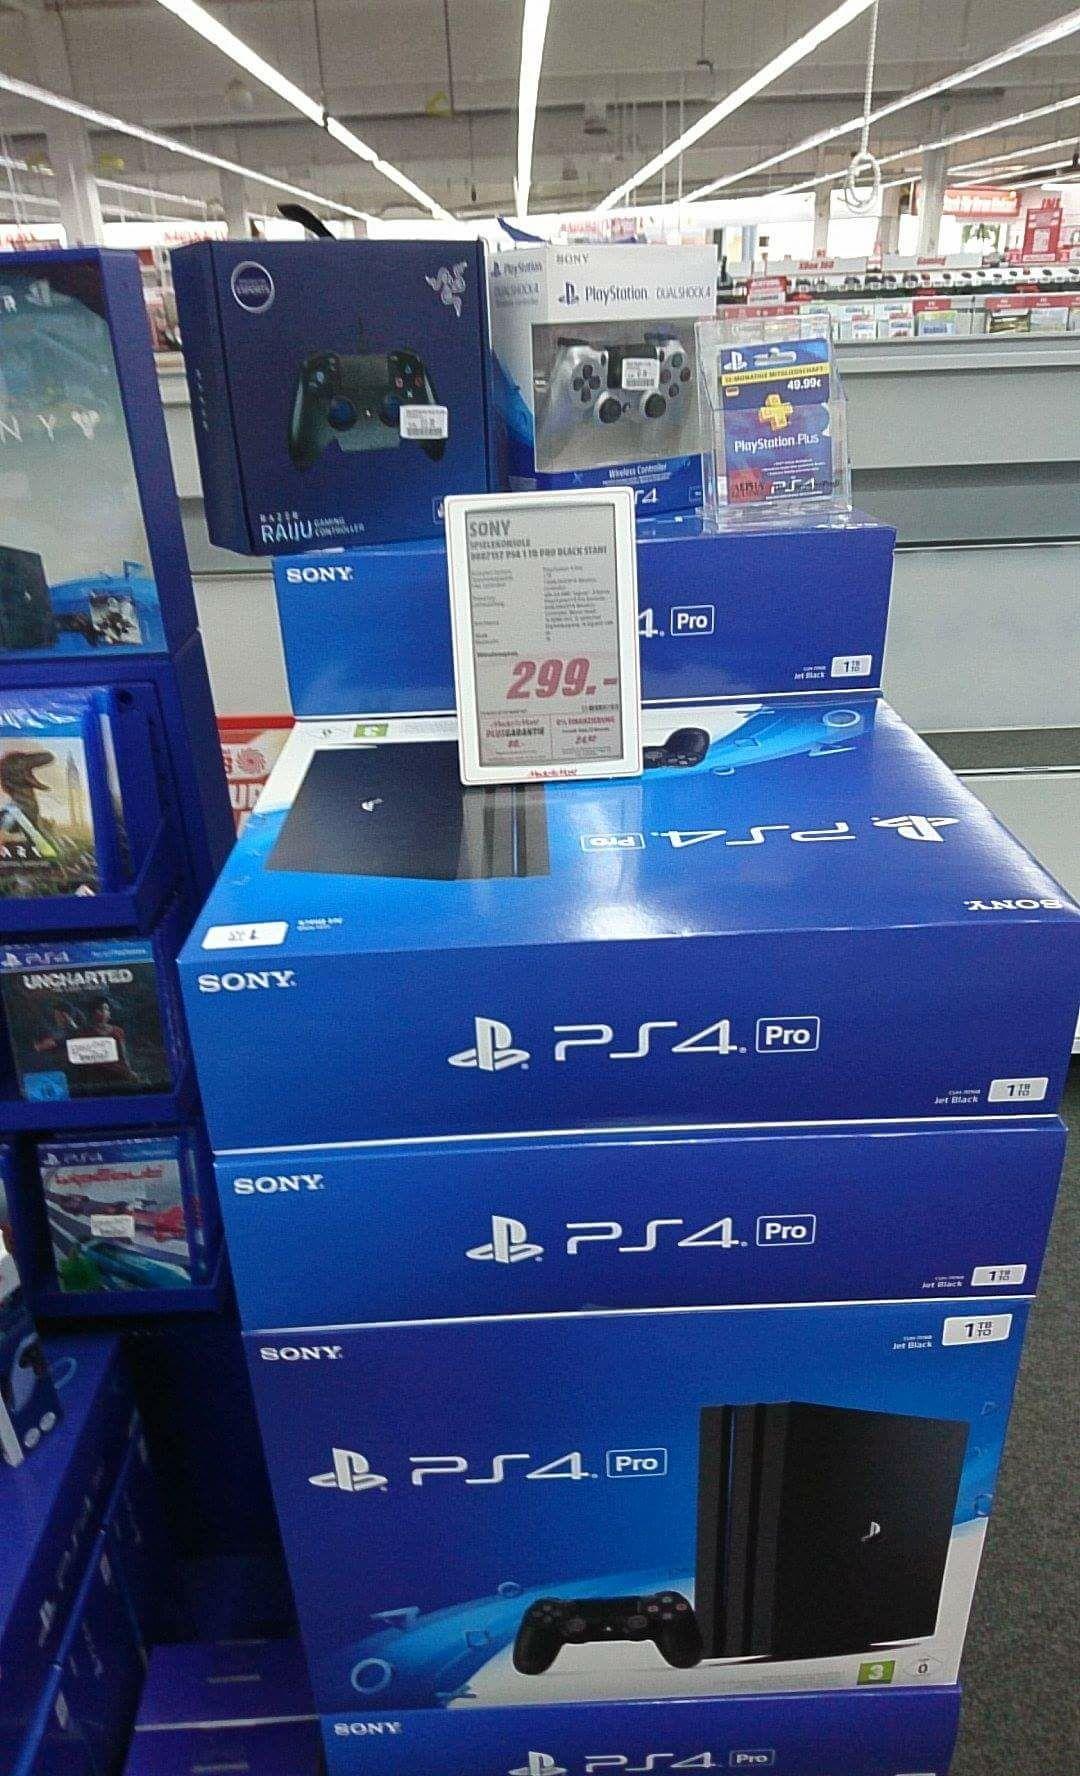 Ps4 Pro 299€